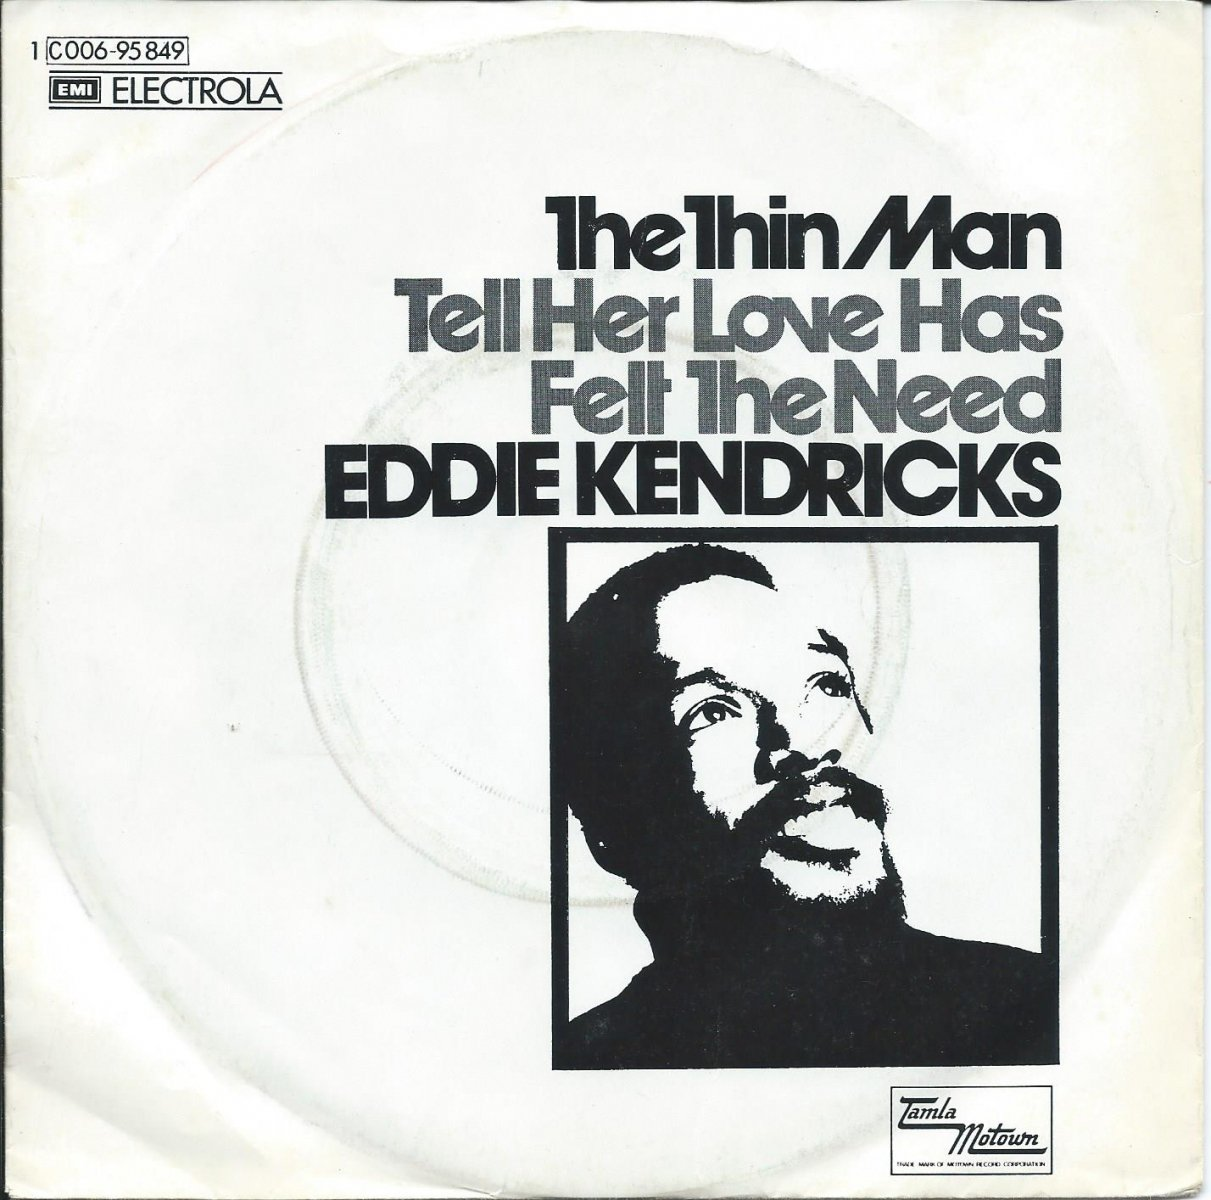 EDDIE KENDRICKS / THE THIN MAN / TELL HER LOVE HAS FELT THE NEED (7